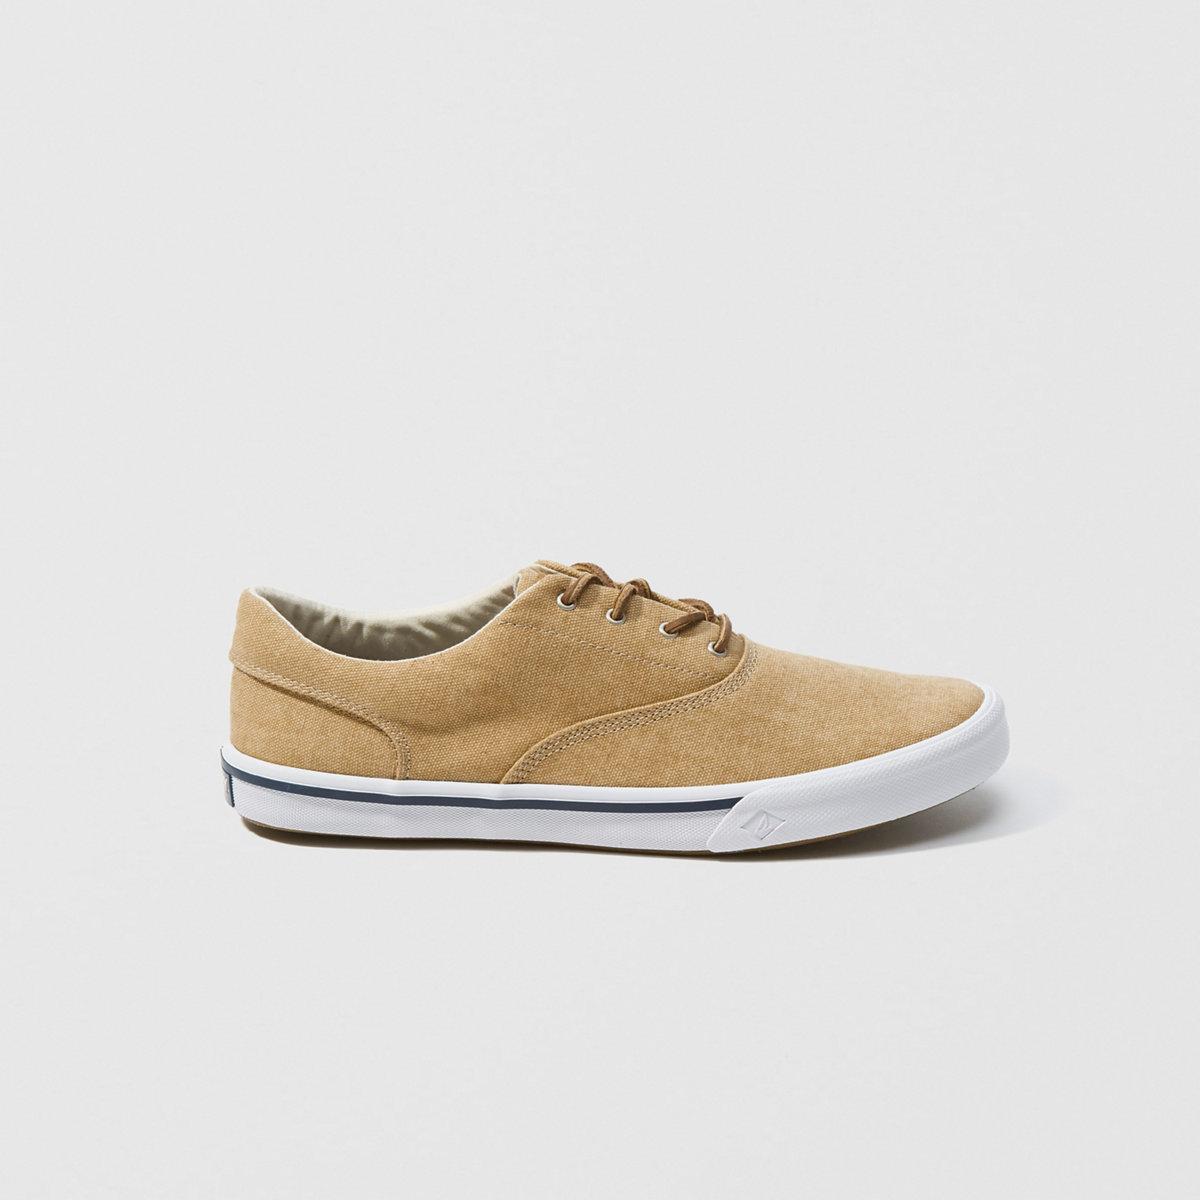 Sperry Striper Shoe